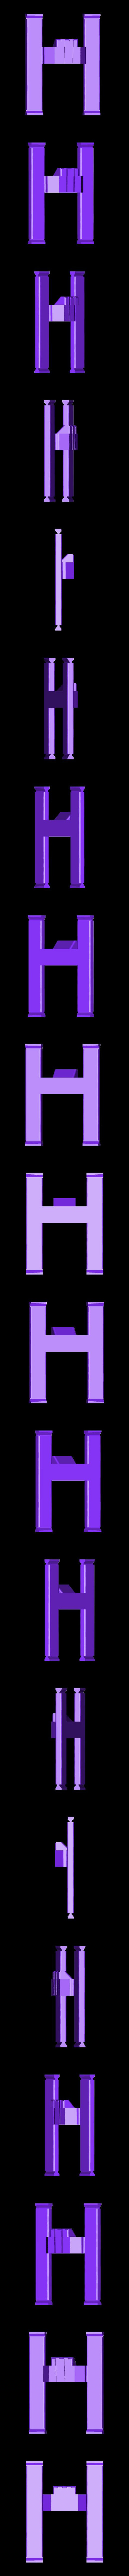 Towel_Basket_Frame.stl Download free STL file The Next Towel • 3D printer template, AcE-Craft